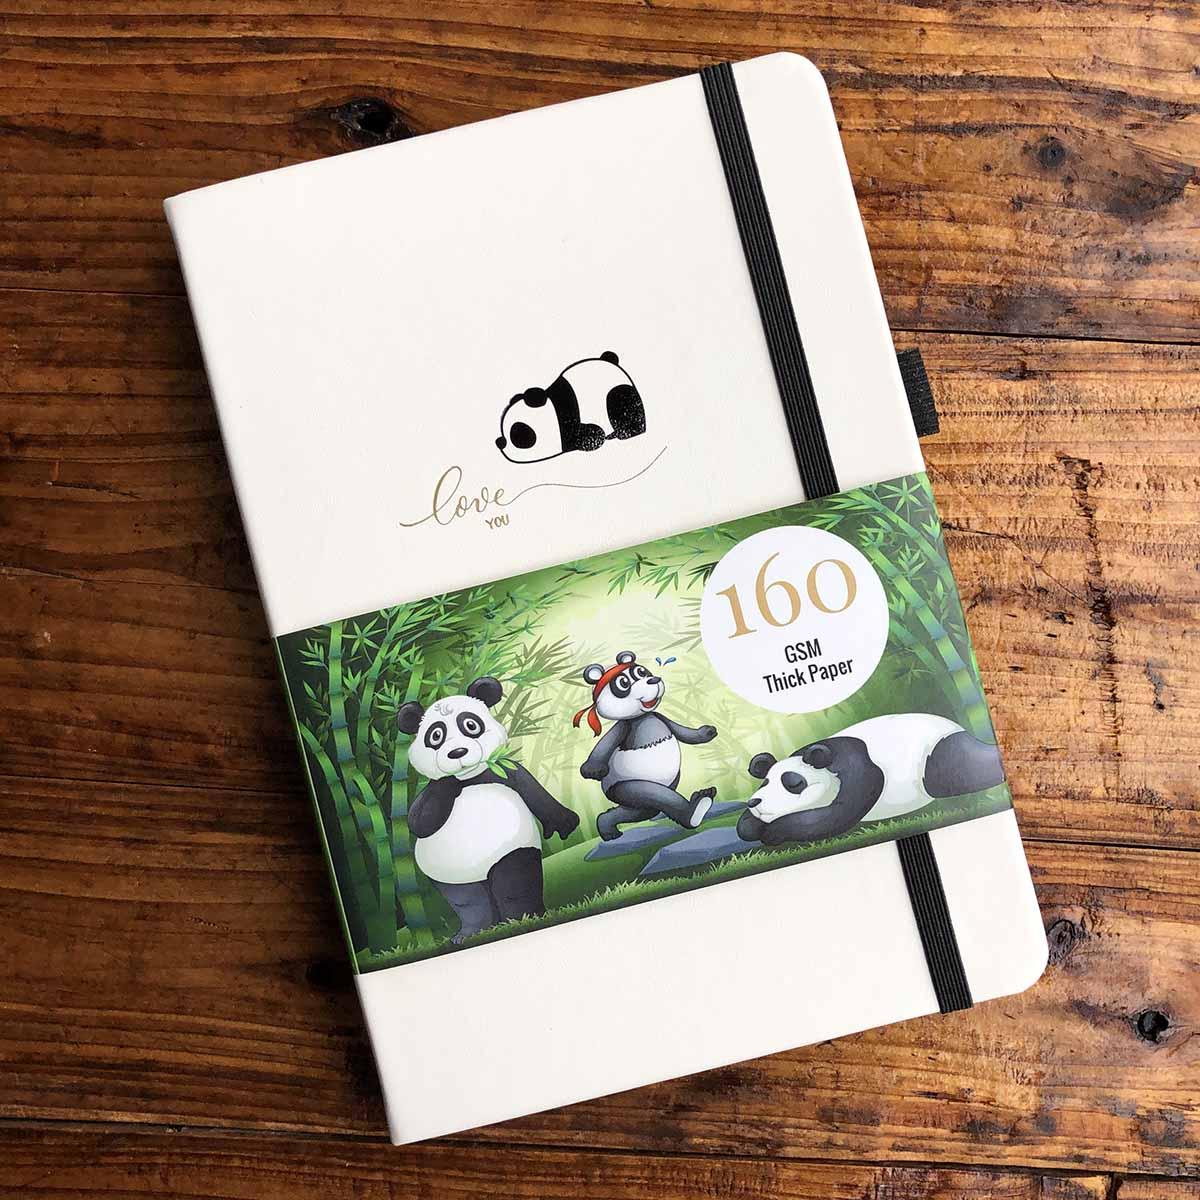 Panda LOGO Bullet Journal Dot Grid Notebook 160GSM Paper 5*5 Mm DOTS, Sketchbook For Ideas